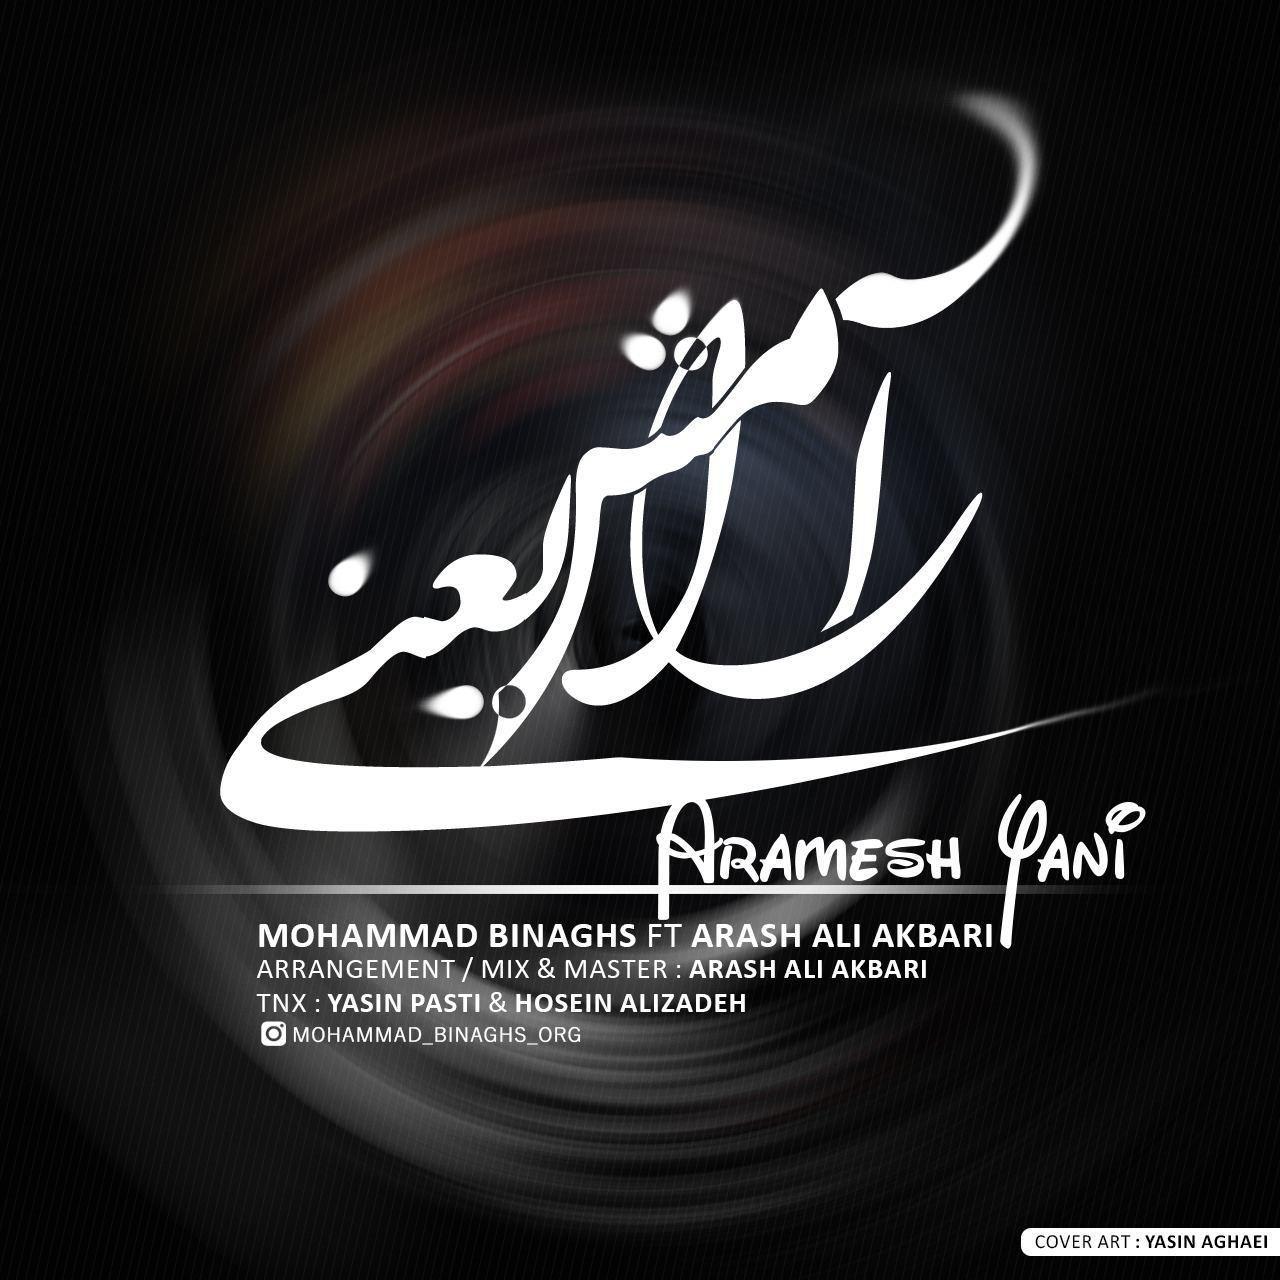 Mohammad Binaghs Ft Arash AliAkbari – Aramesh Yani